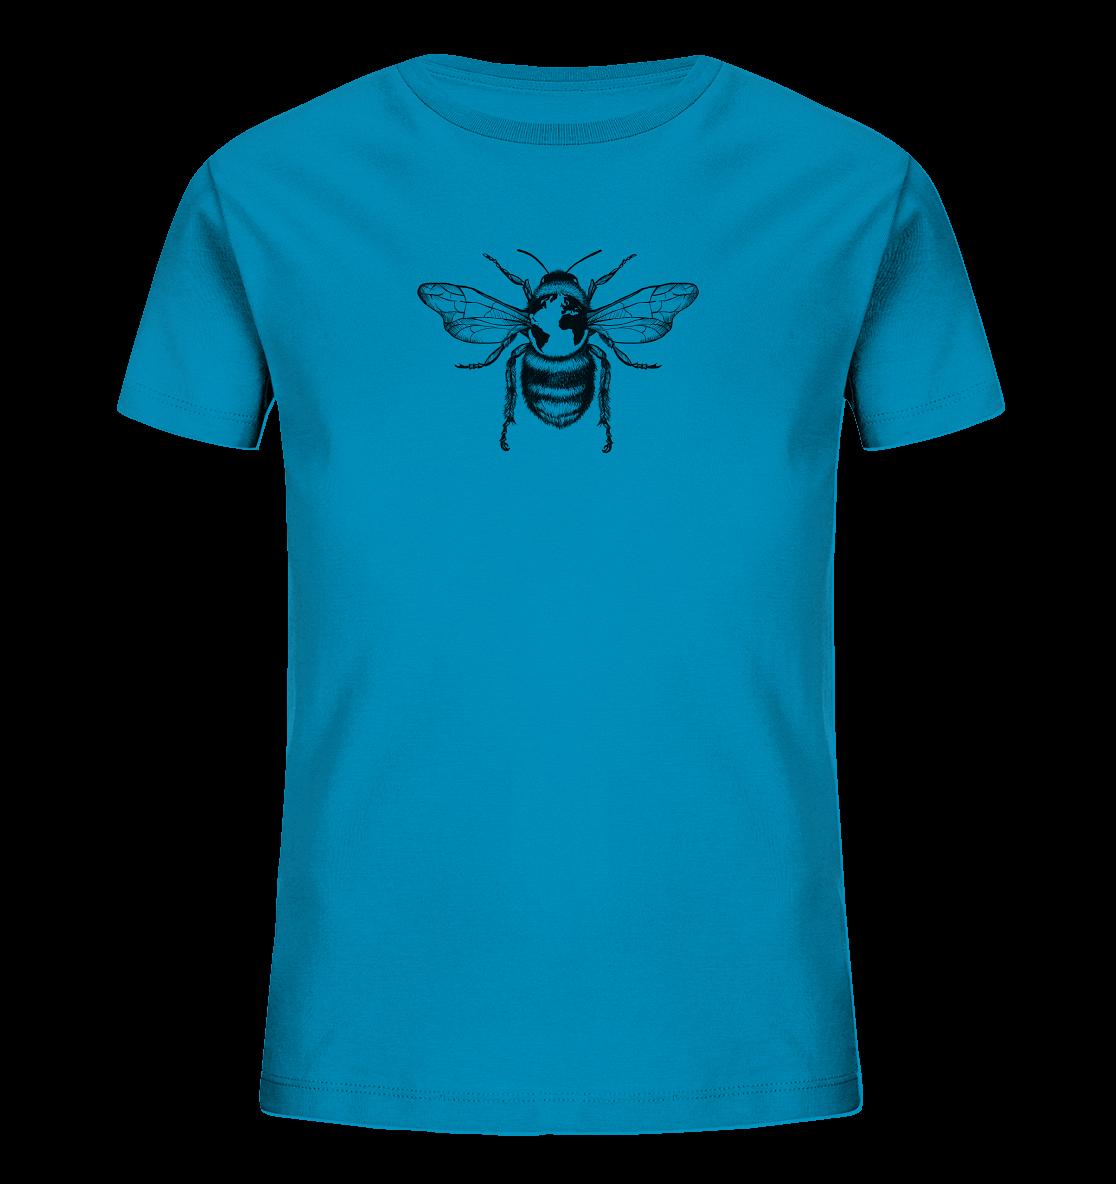 front-kids-organic-shirt-0092c0-1116x-2.png